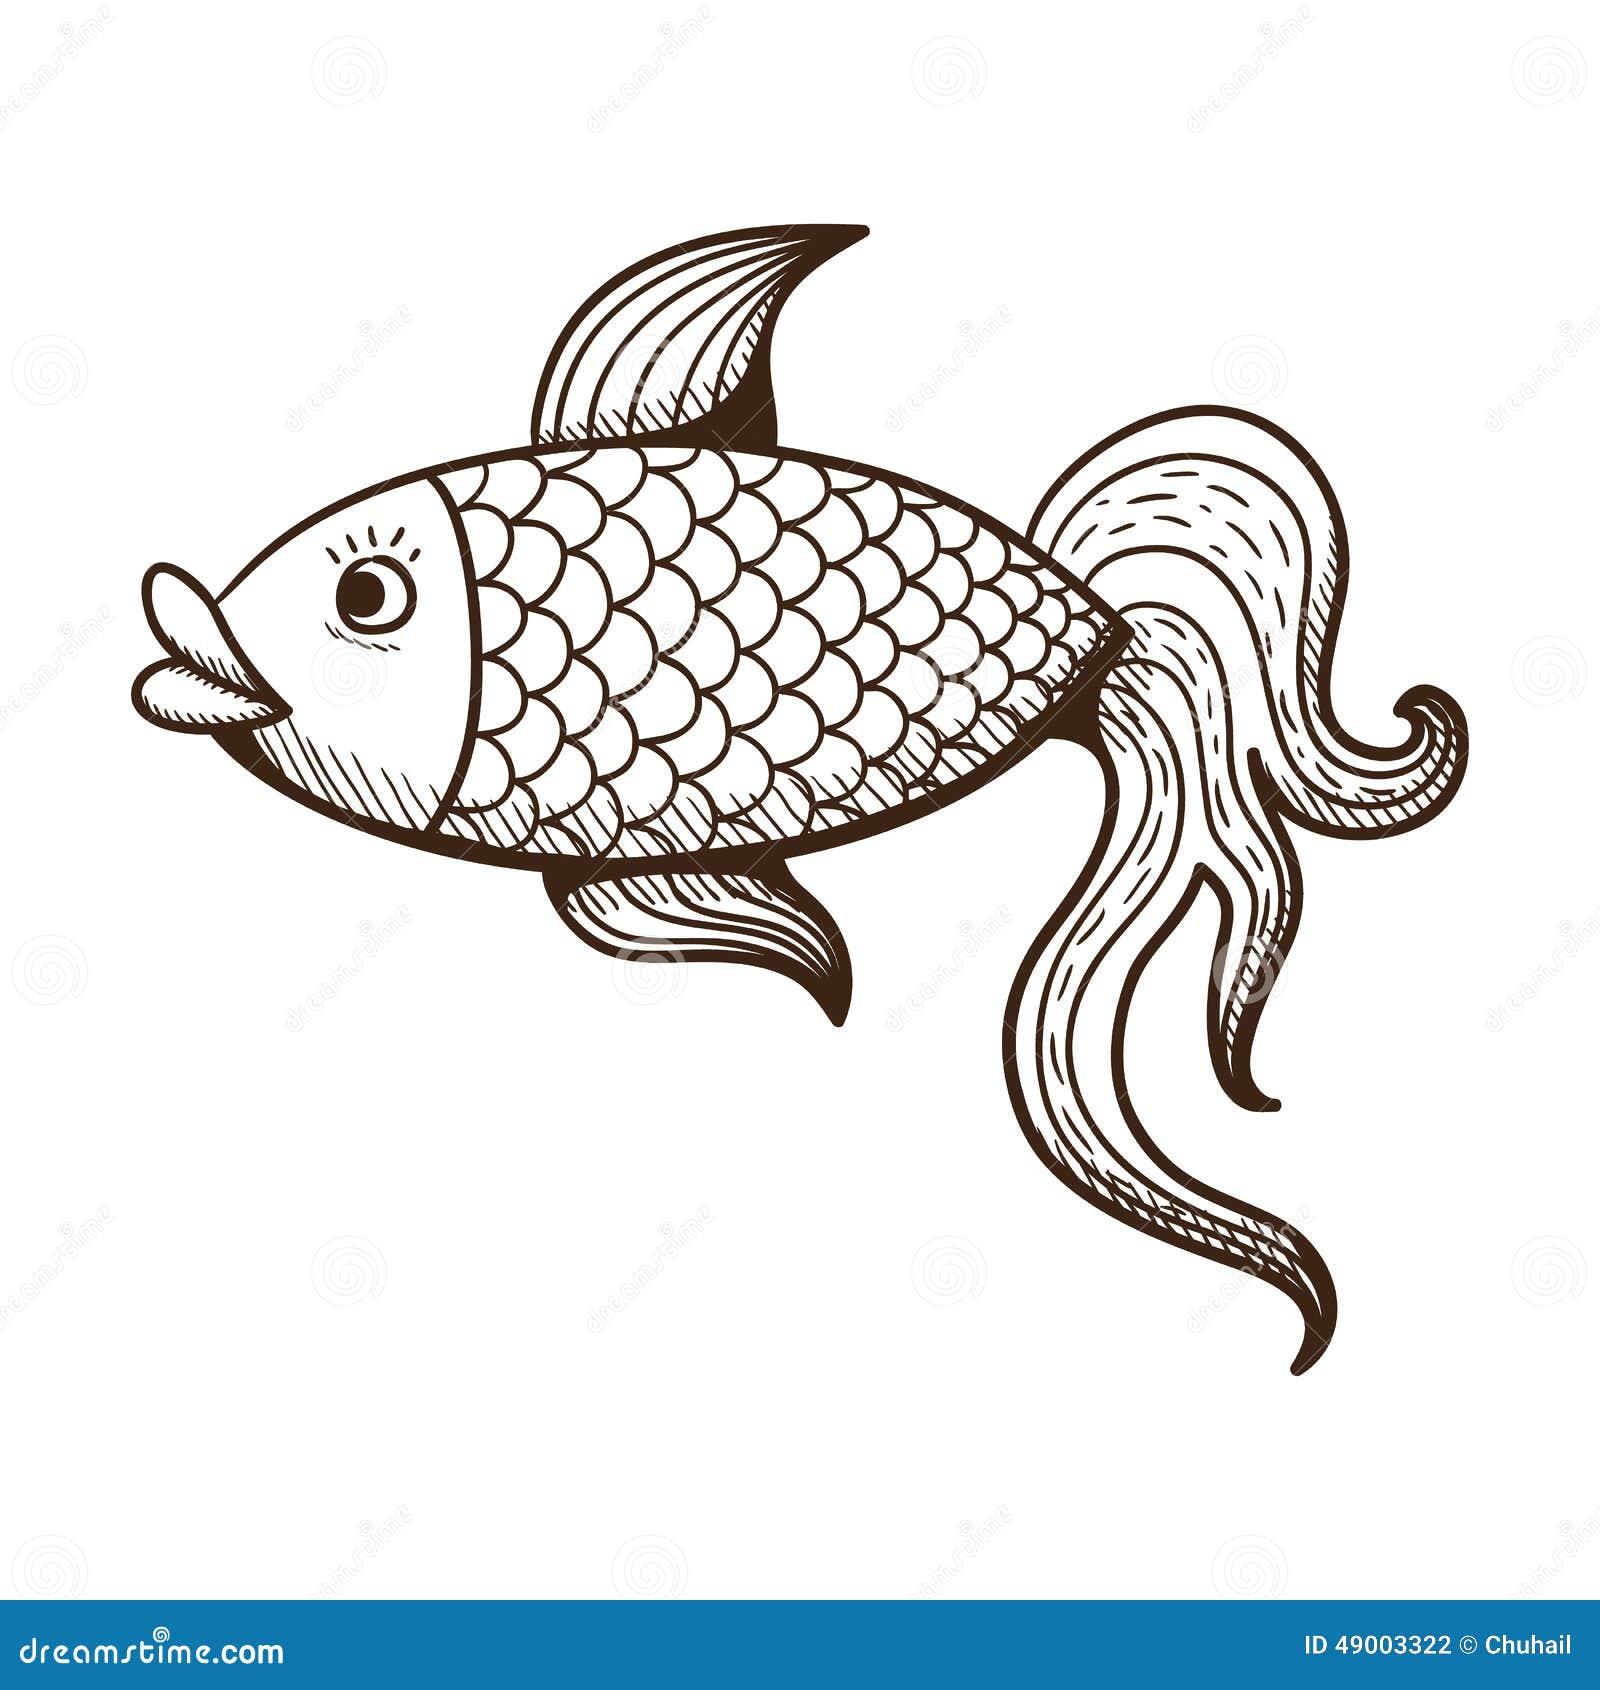 Golden Fish. Stock Vector - Image 49003322